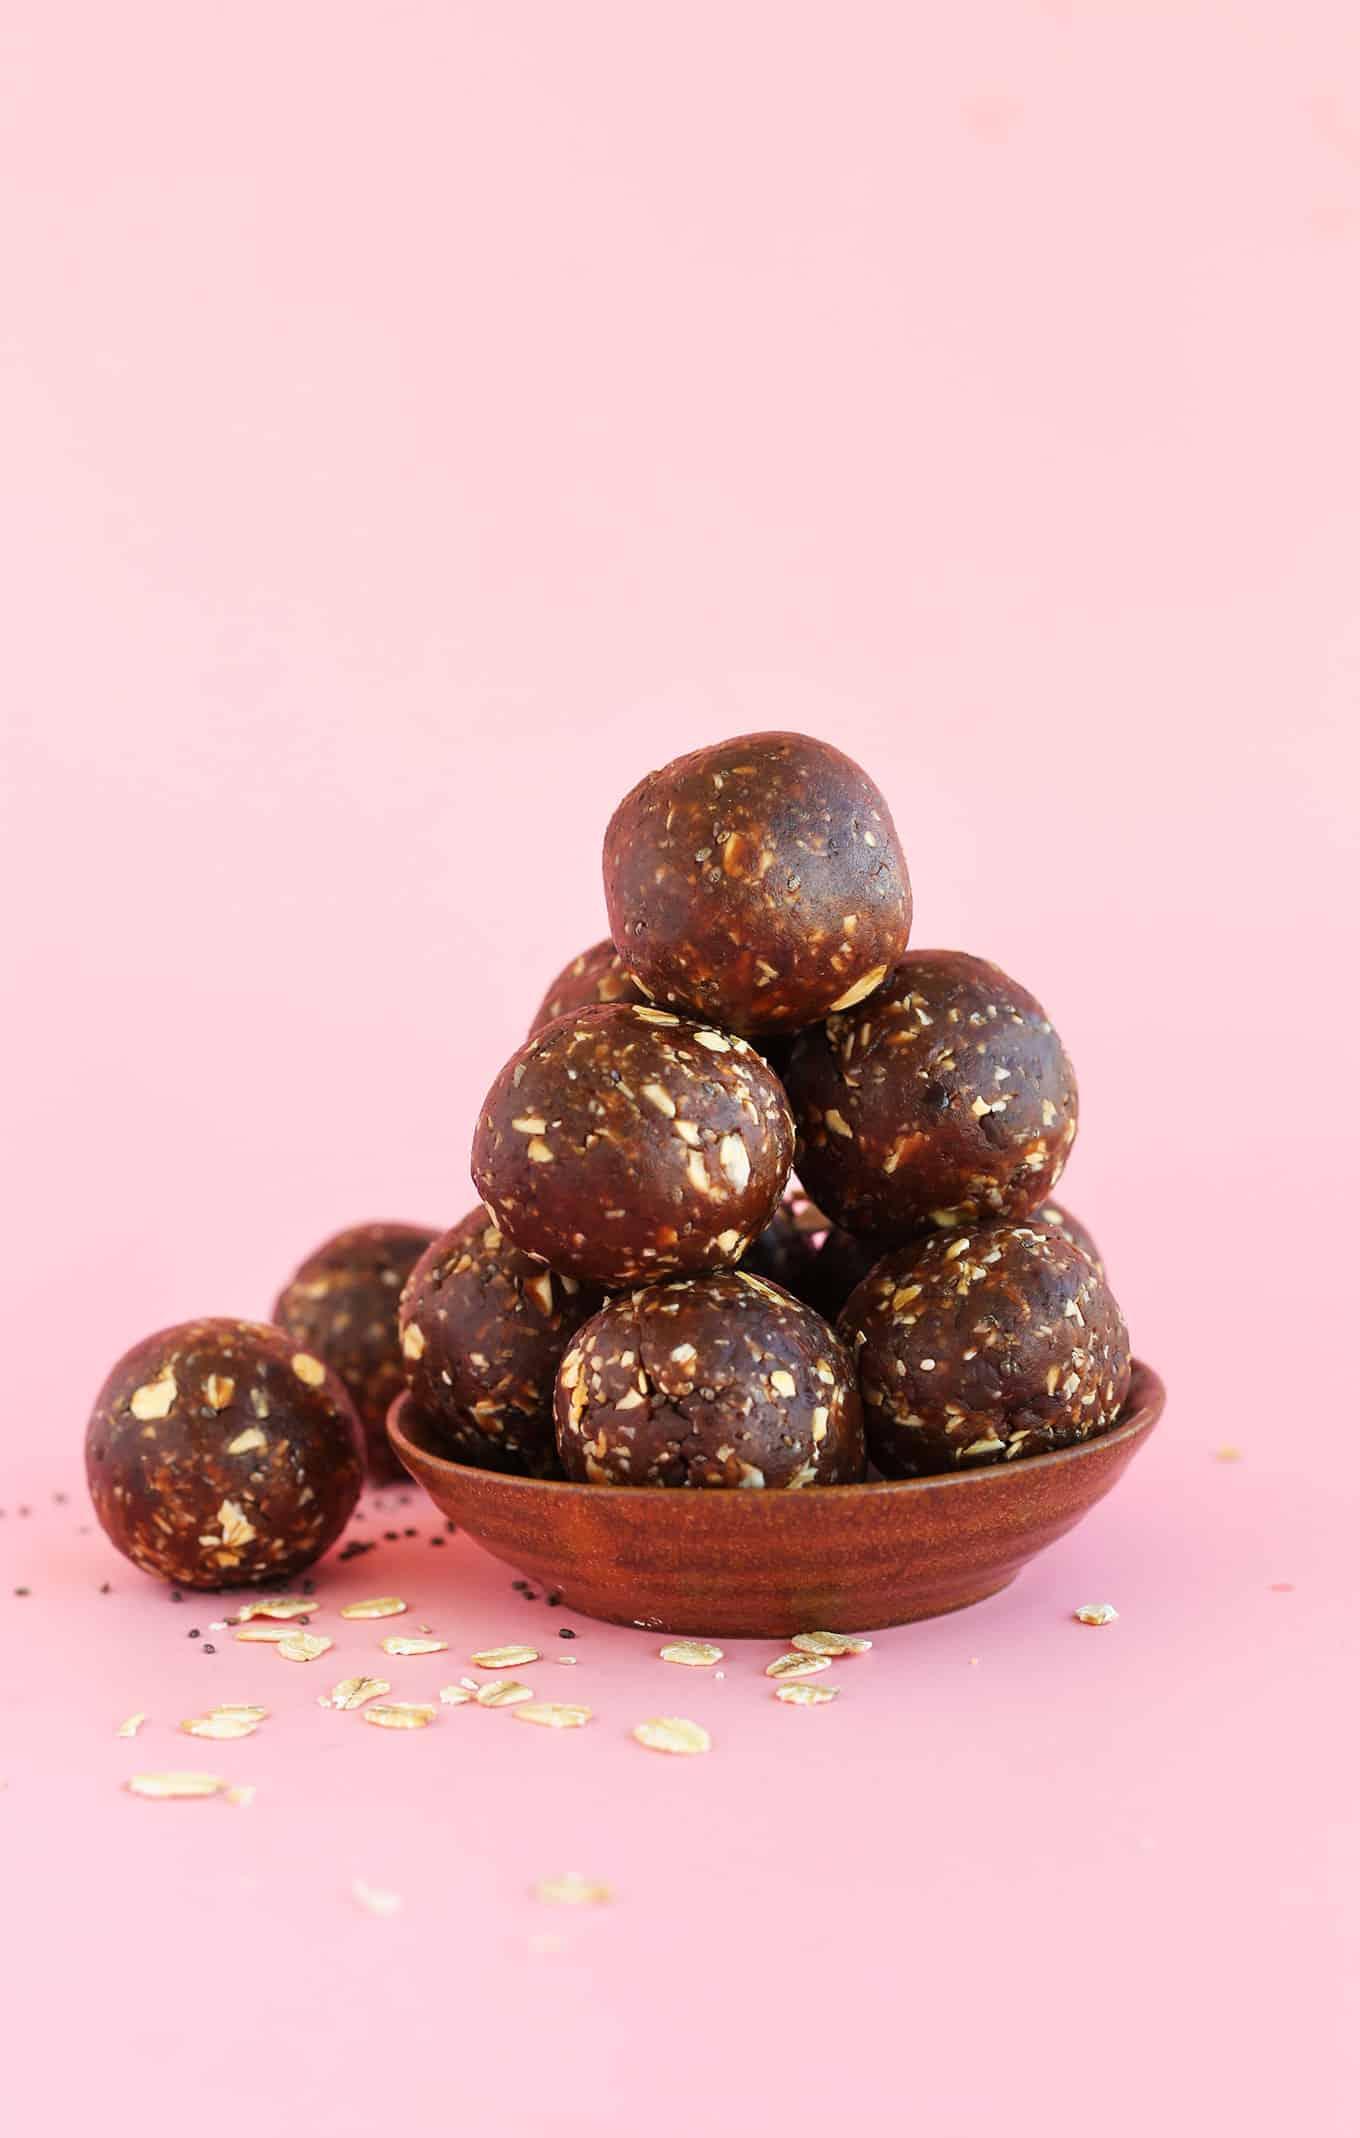 Peanut-Butter-Cup-Chia-Seed-Energy-Bites-vegan-glutenfree-chocolate